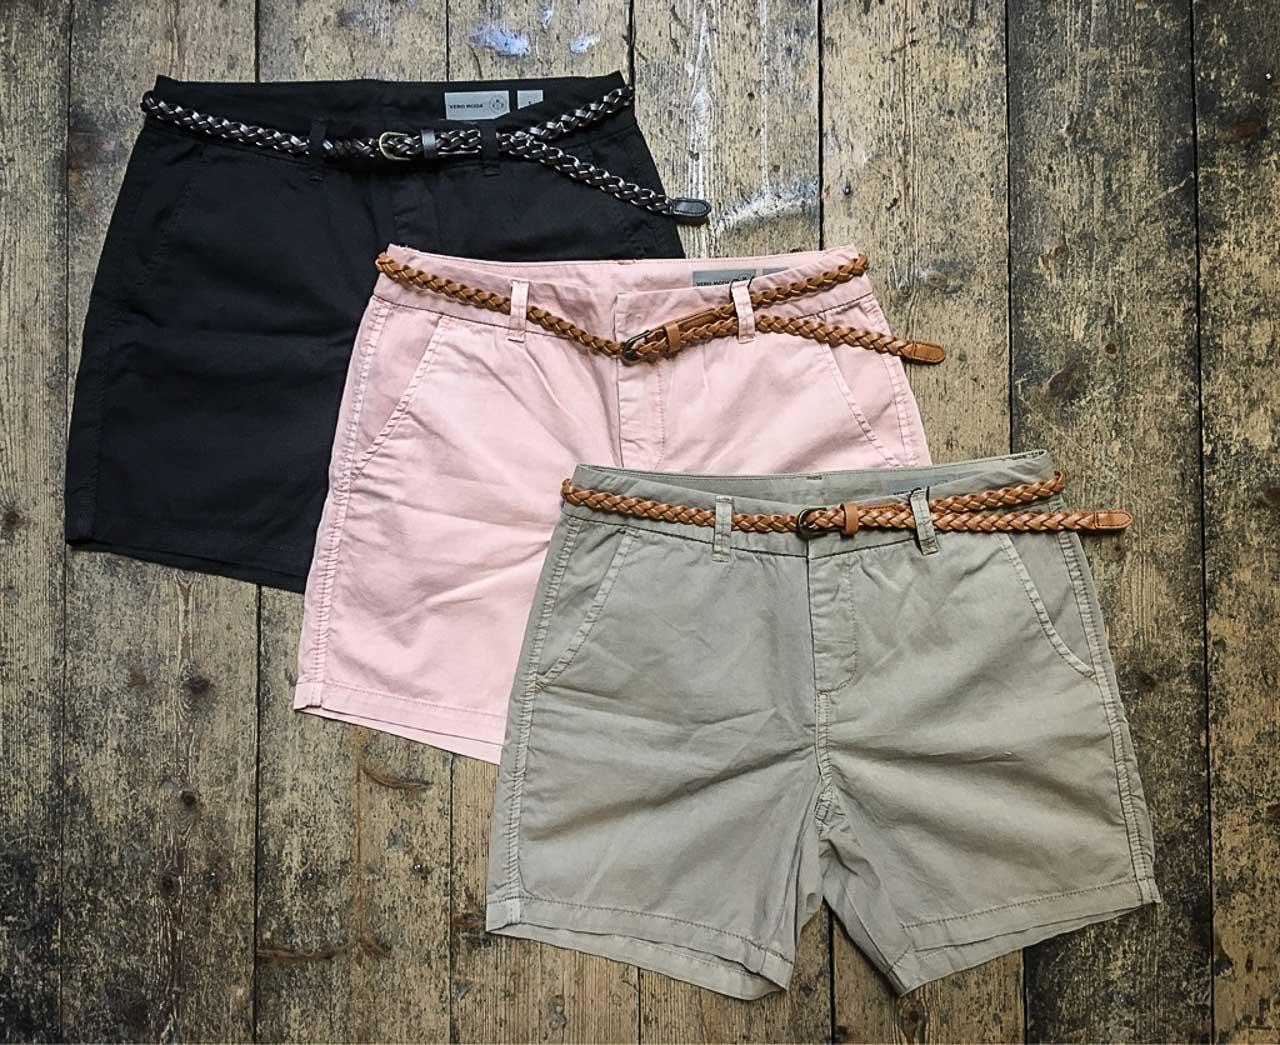 Vero Moda Shorts im Sale